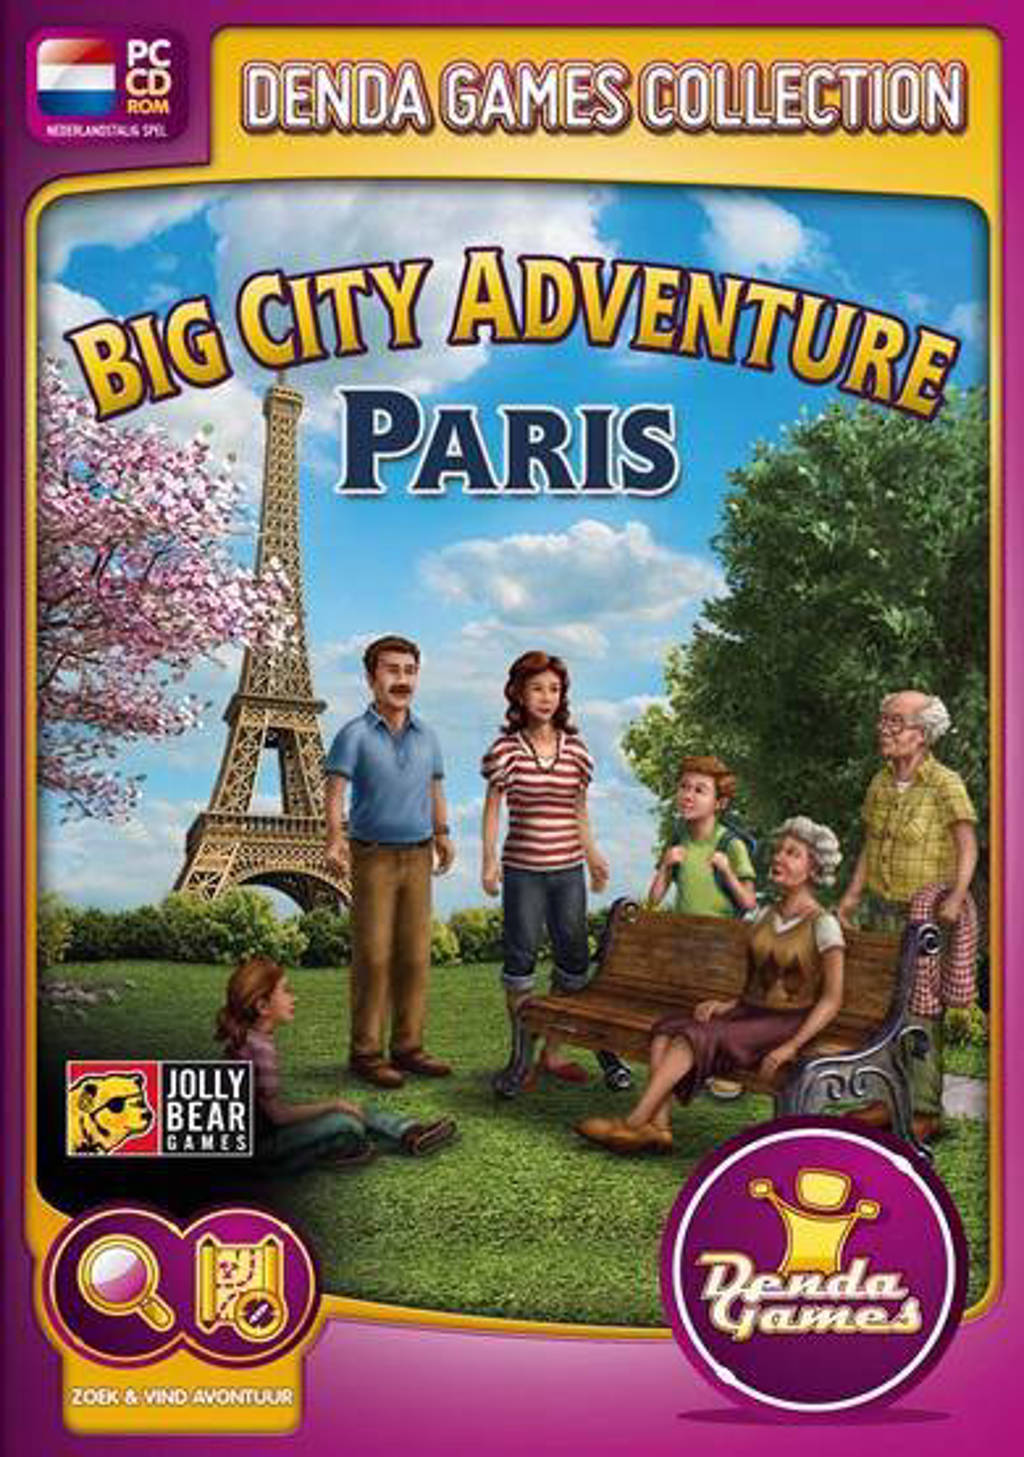 Big city adventure - Paris (PC)